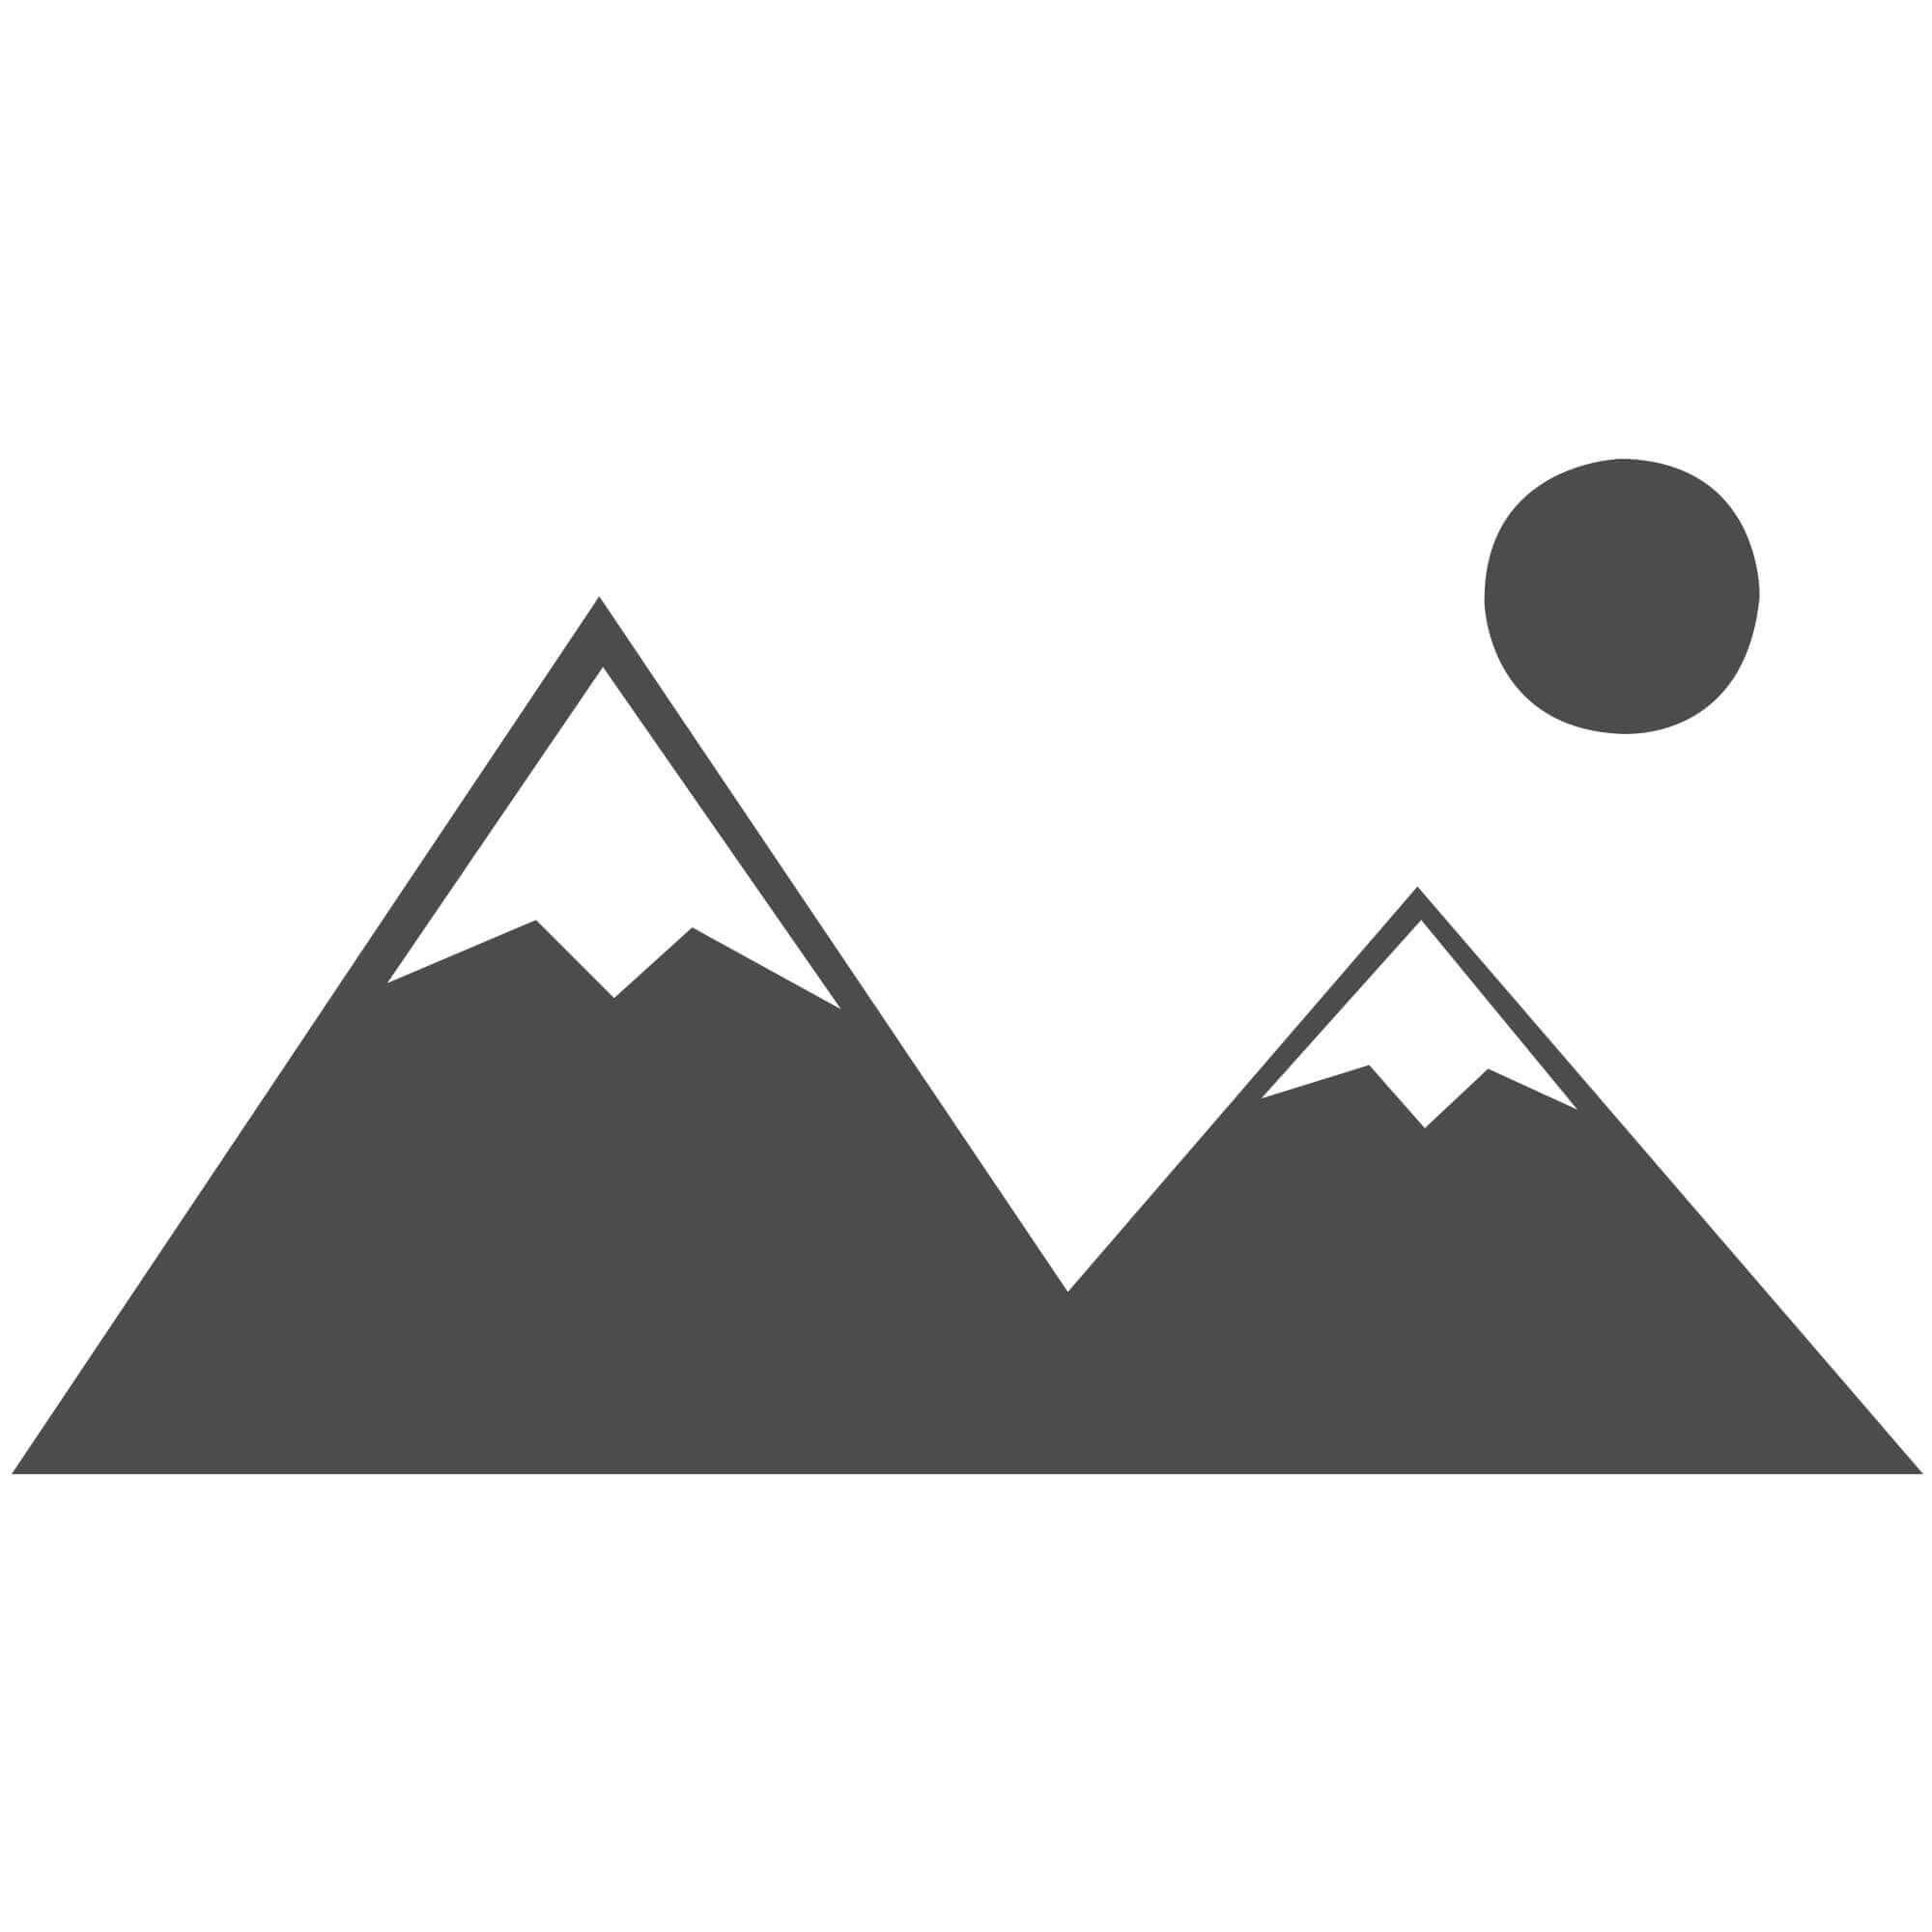 Indian Kilim Flat-weave Rug - 127 x 190 cm